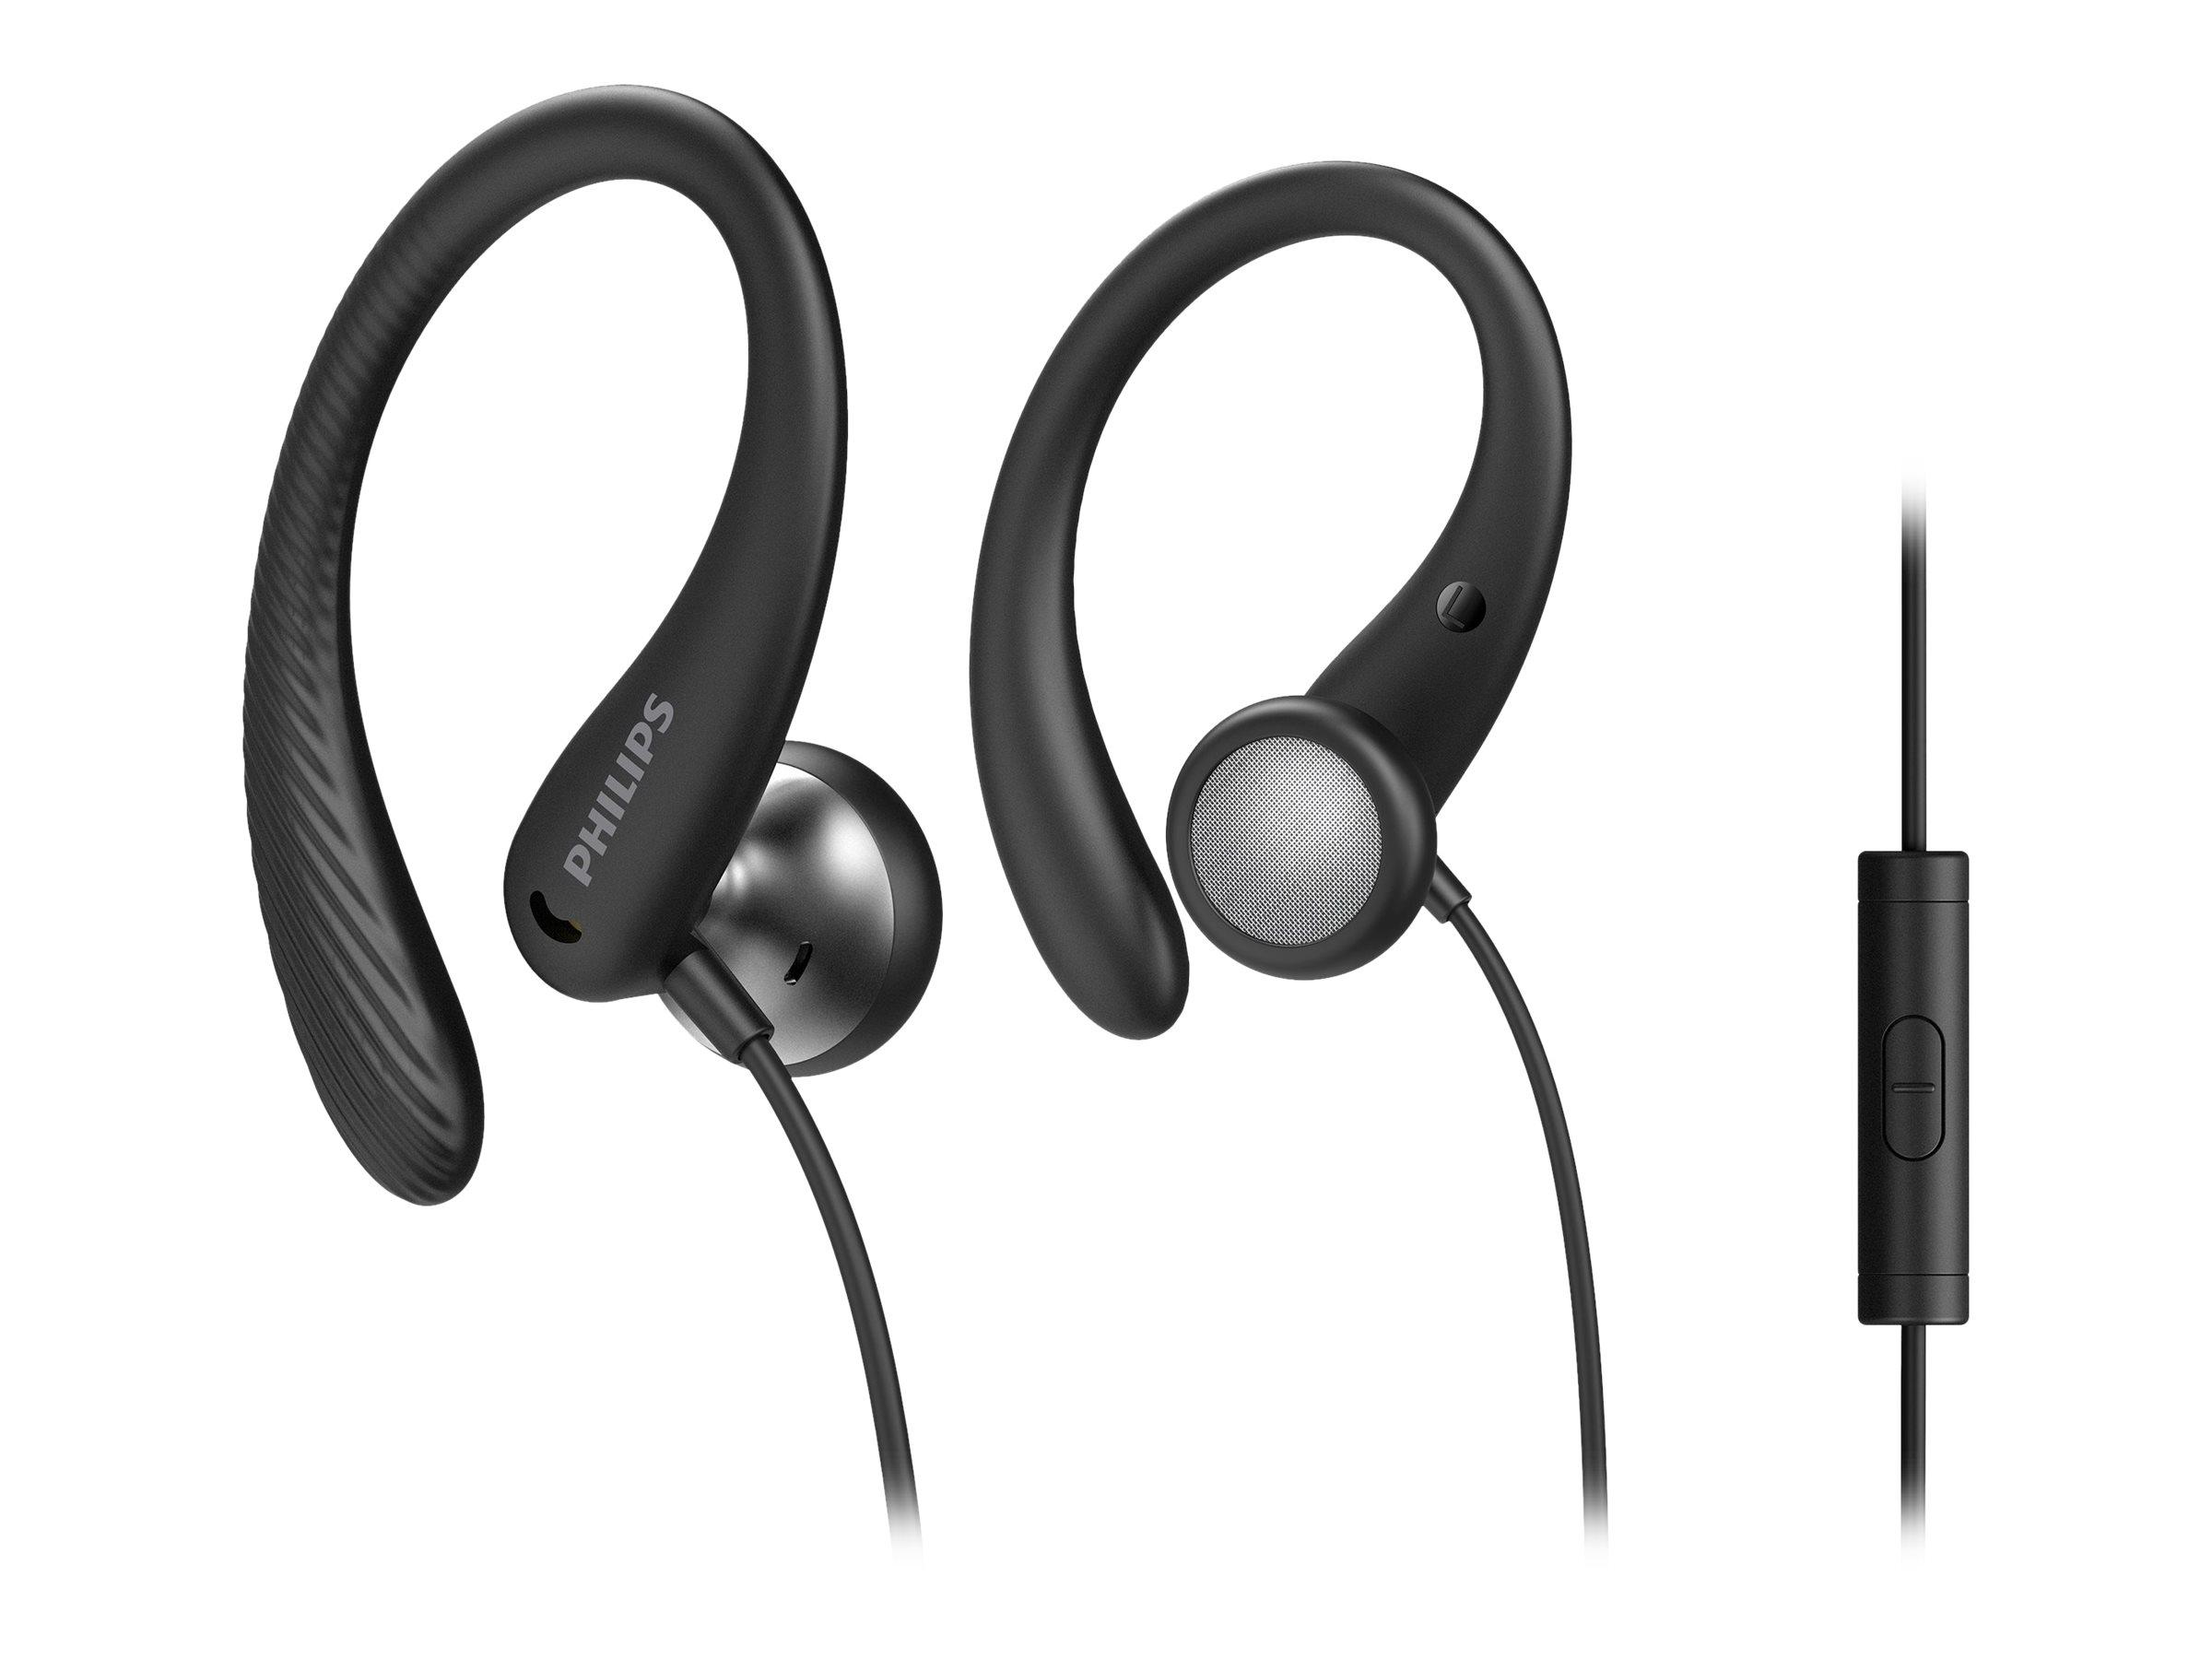 Philips TAA1105BK - Ohrhörer mit Mikrofon - Ohrstöpsel - über dem Ohr angebracht - kabelgebunden - 3,5 mm Stecker